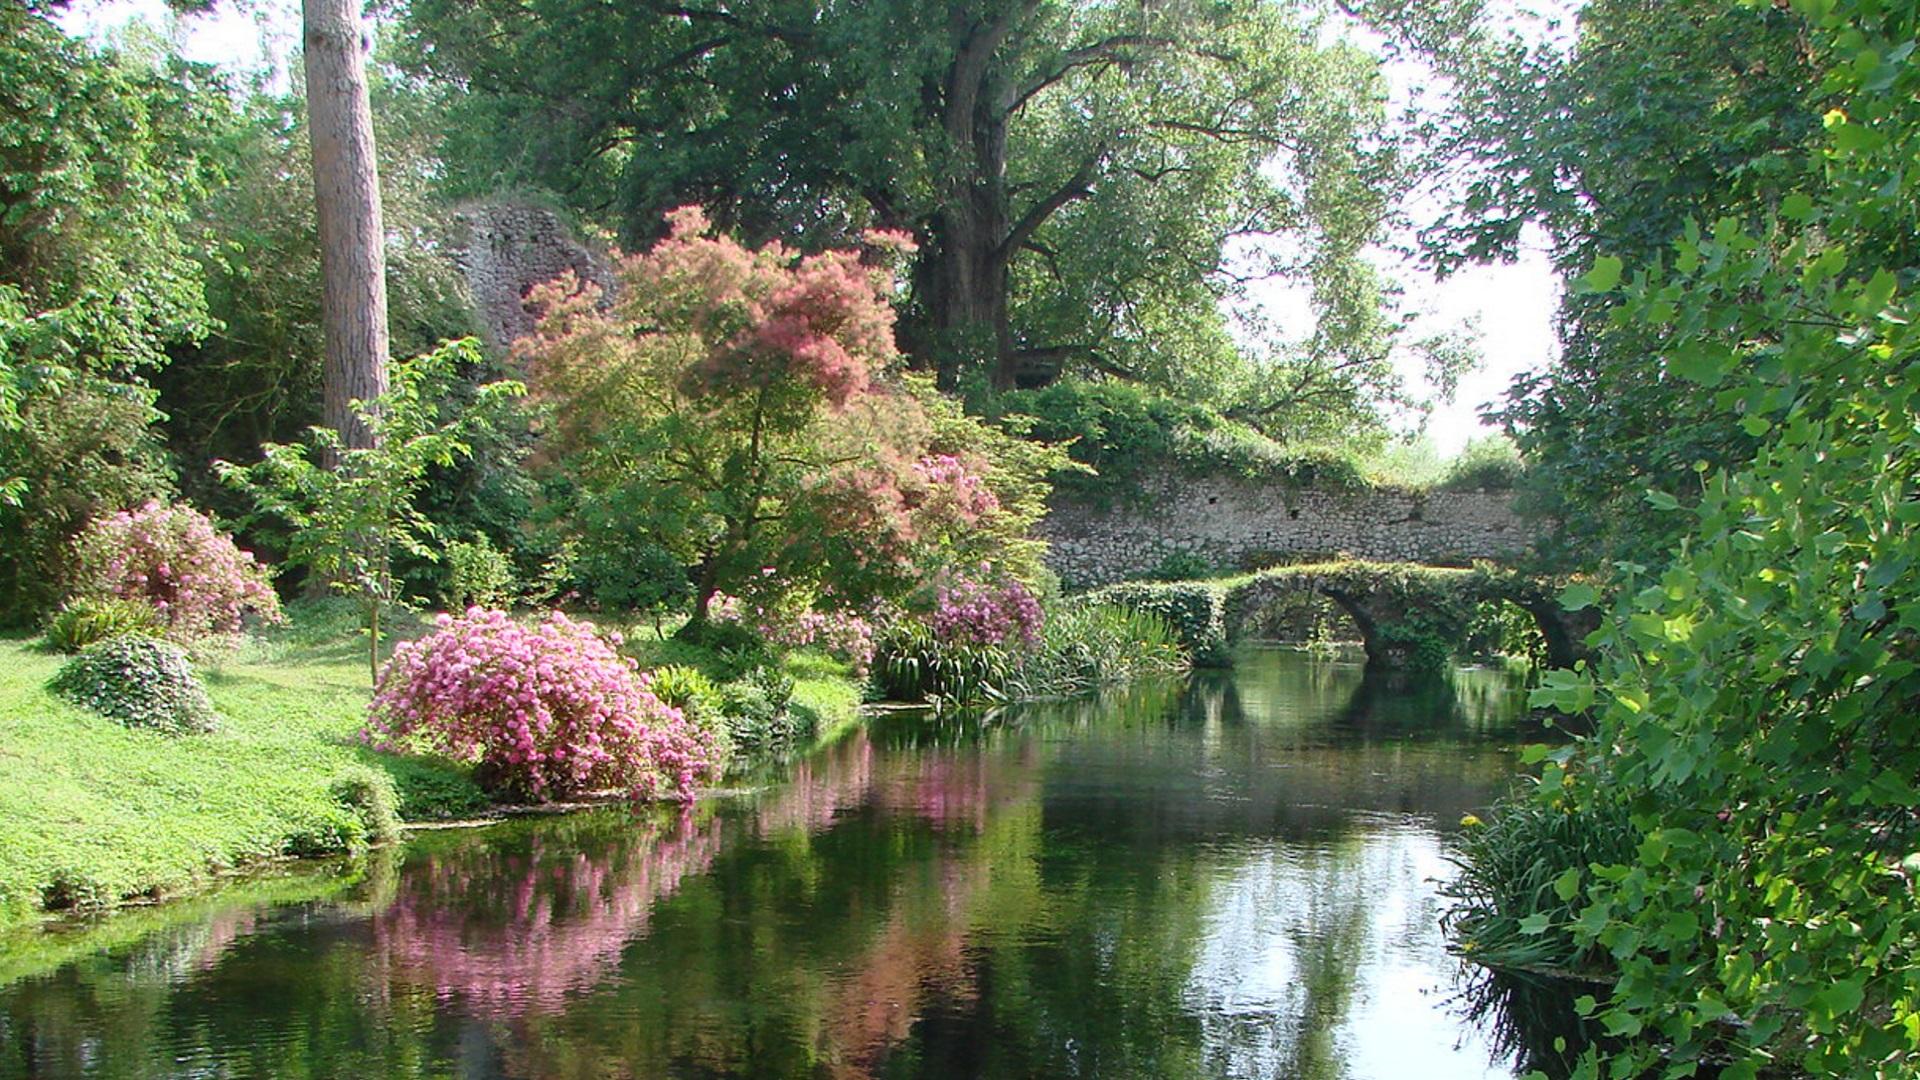 I giardini di ninfa sito ufficiale. Róma-utazási tanácsok - Index Fórum